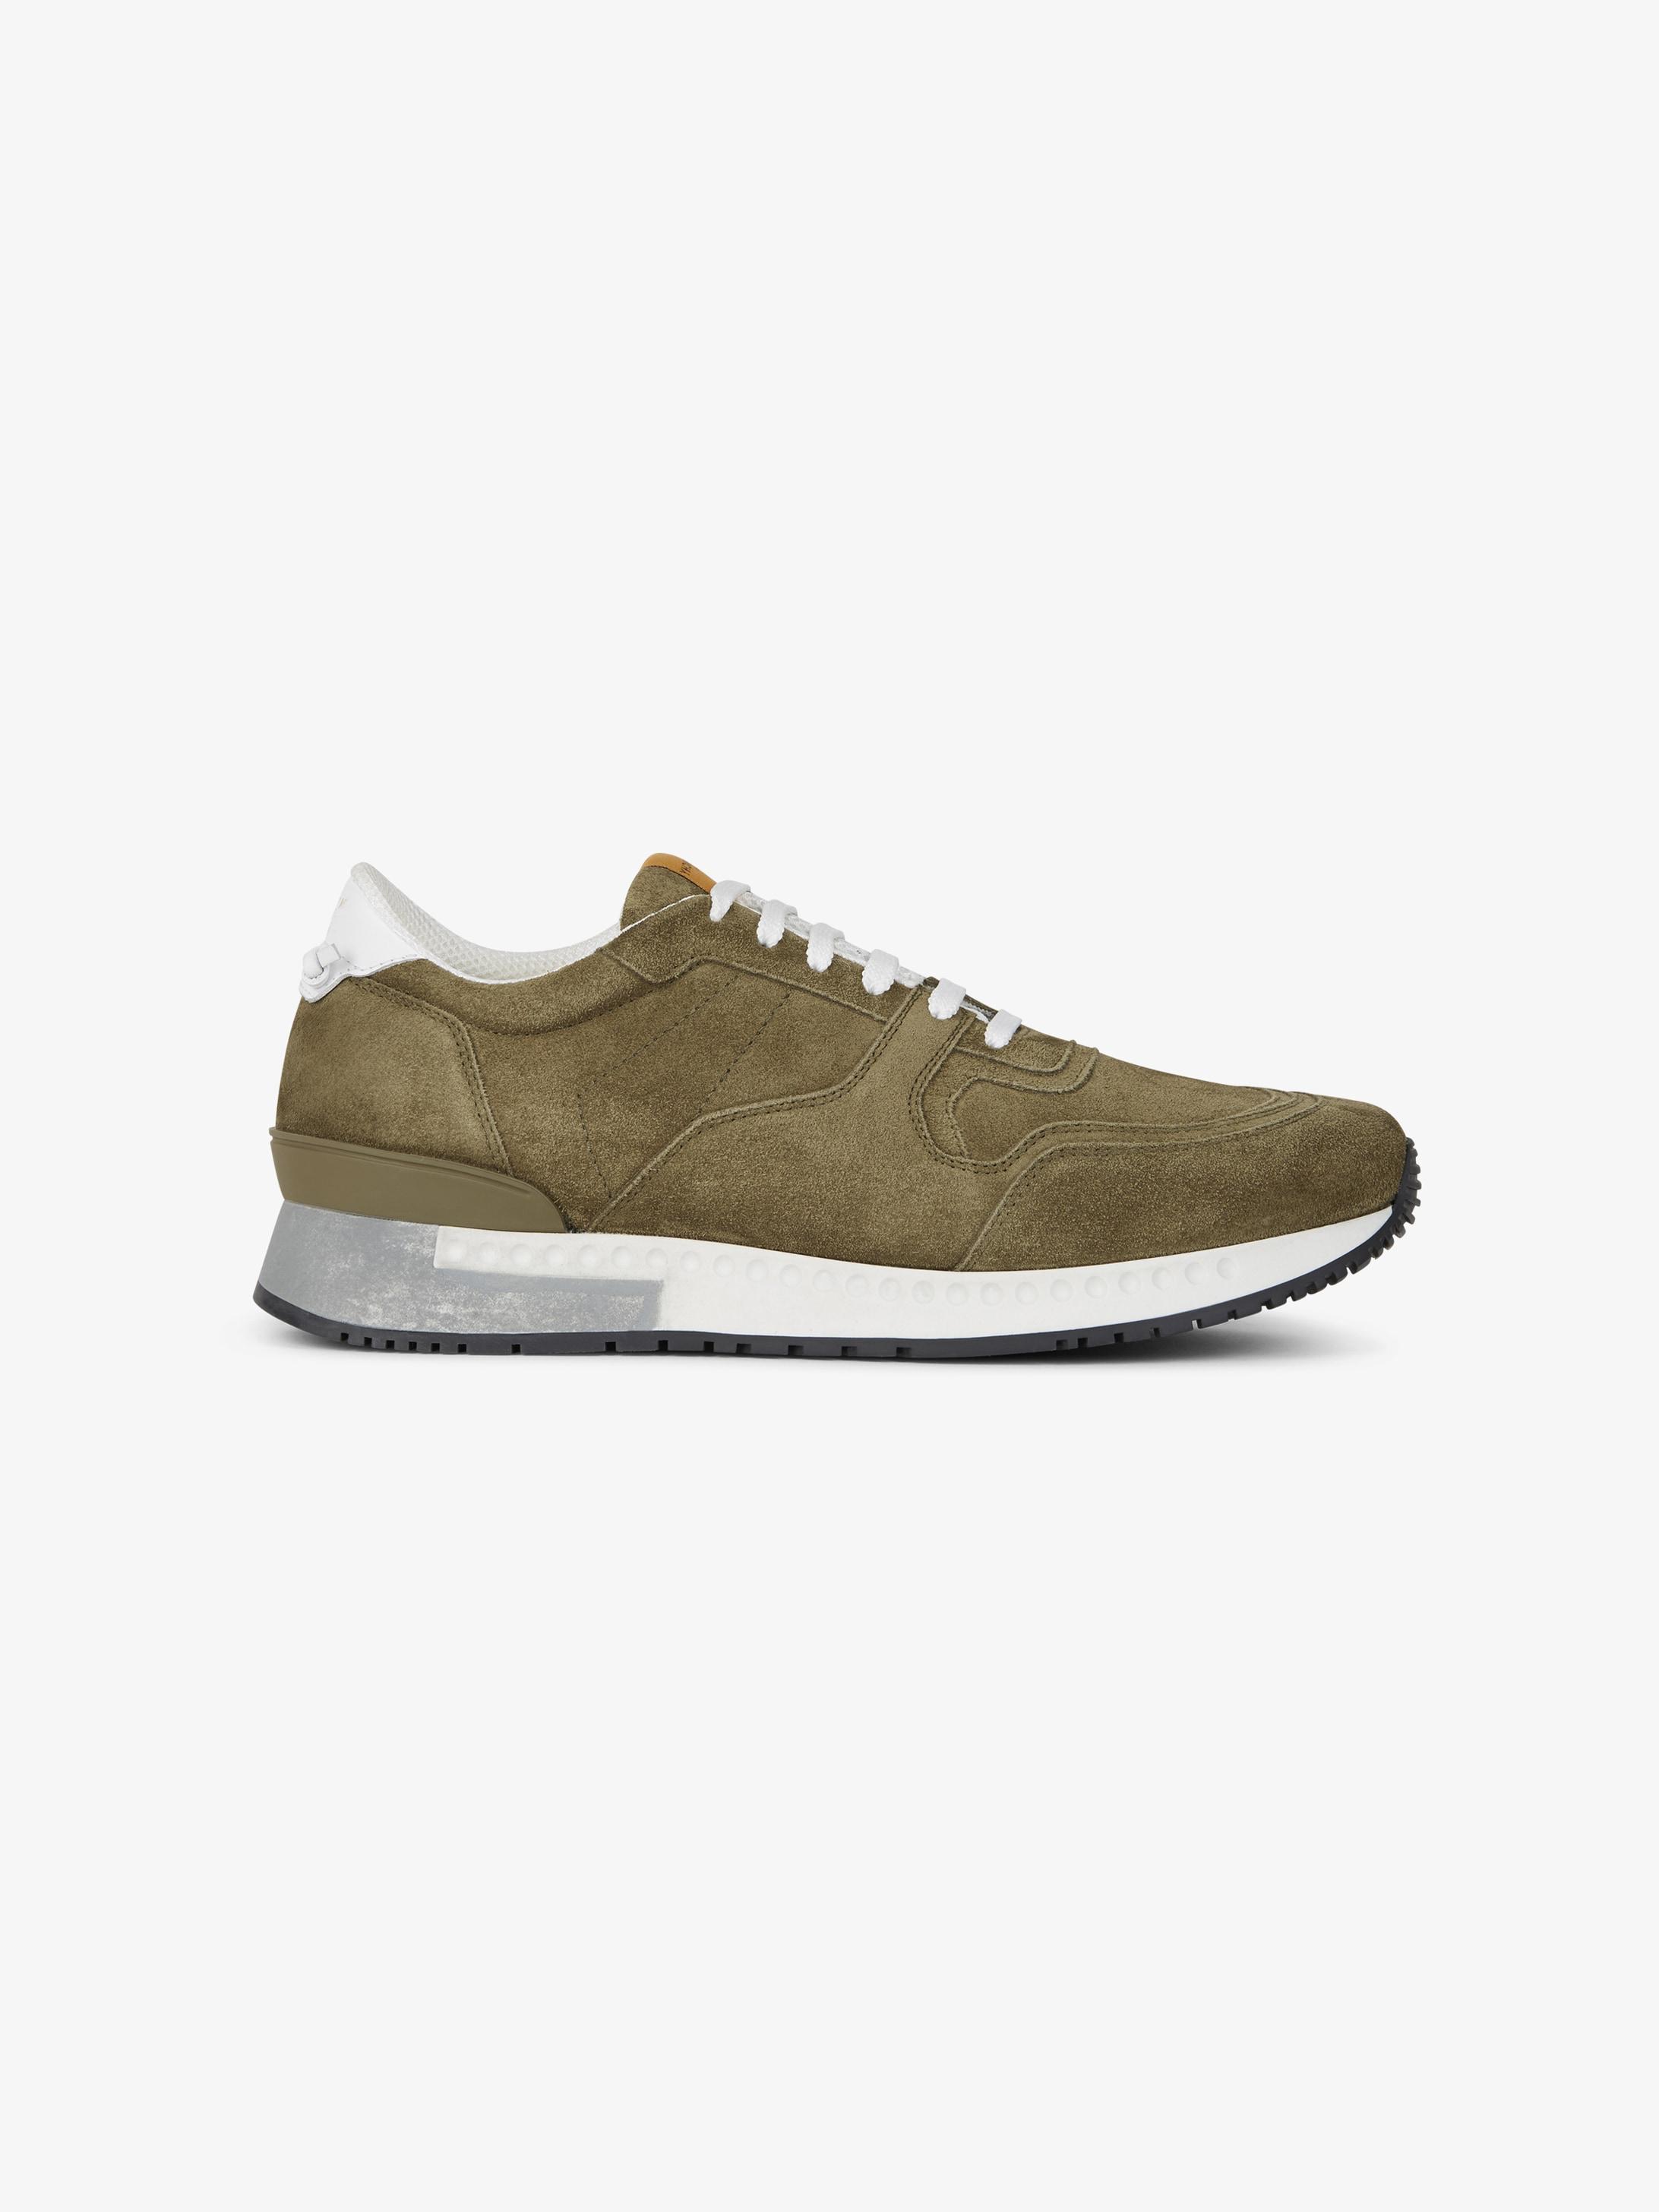 Runner sneakers in suede